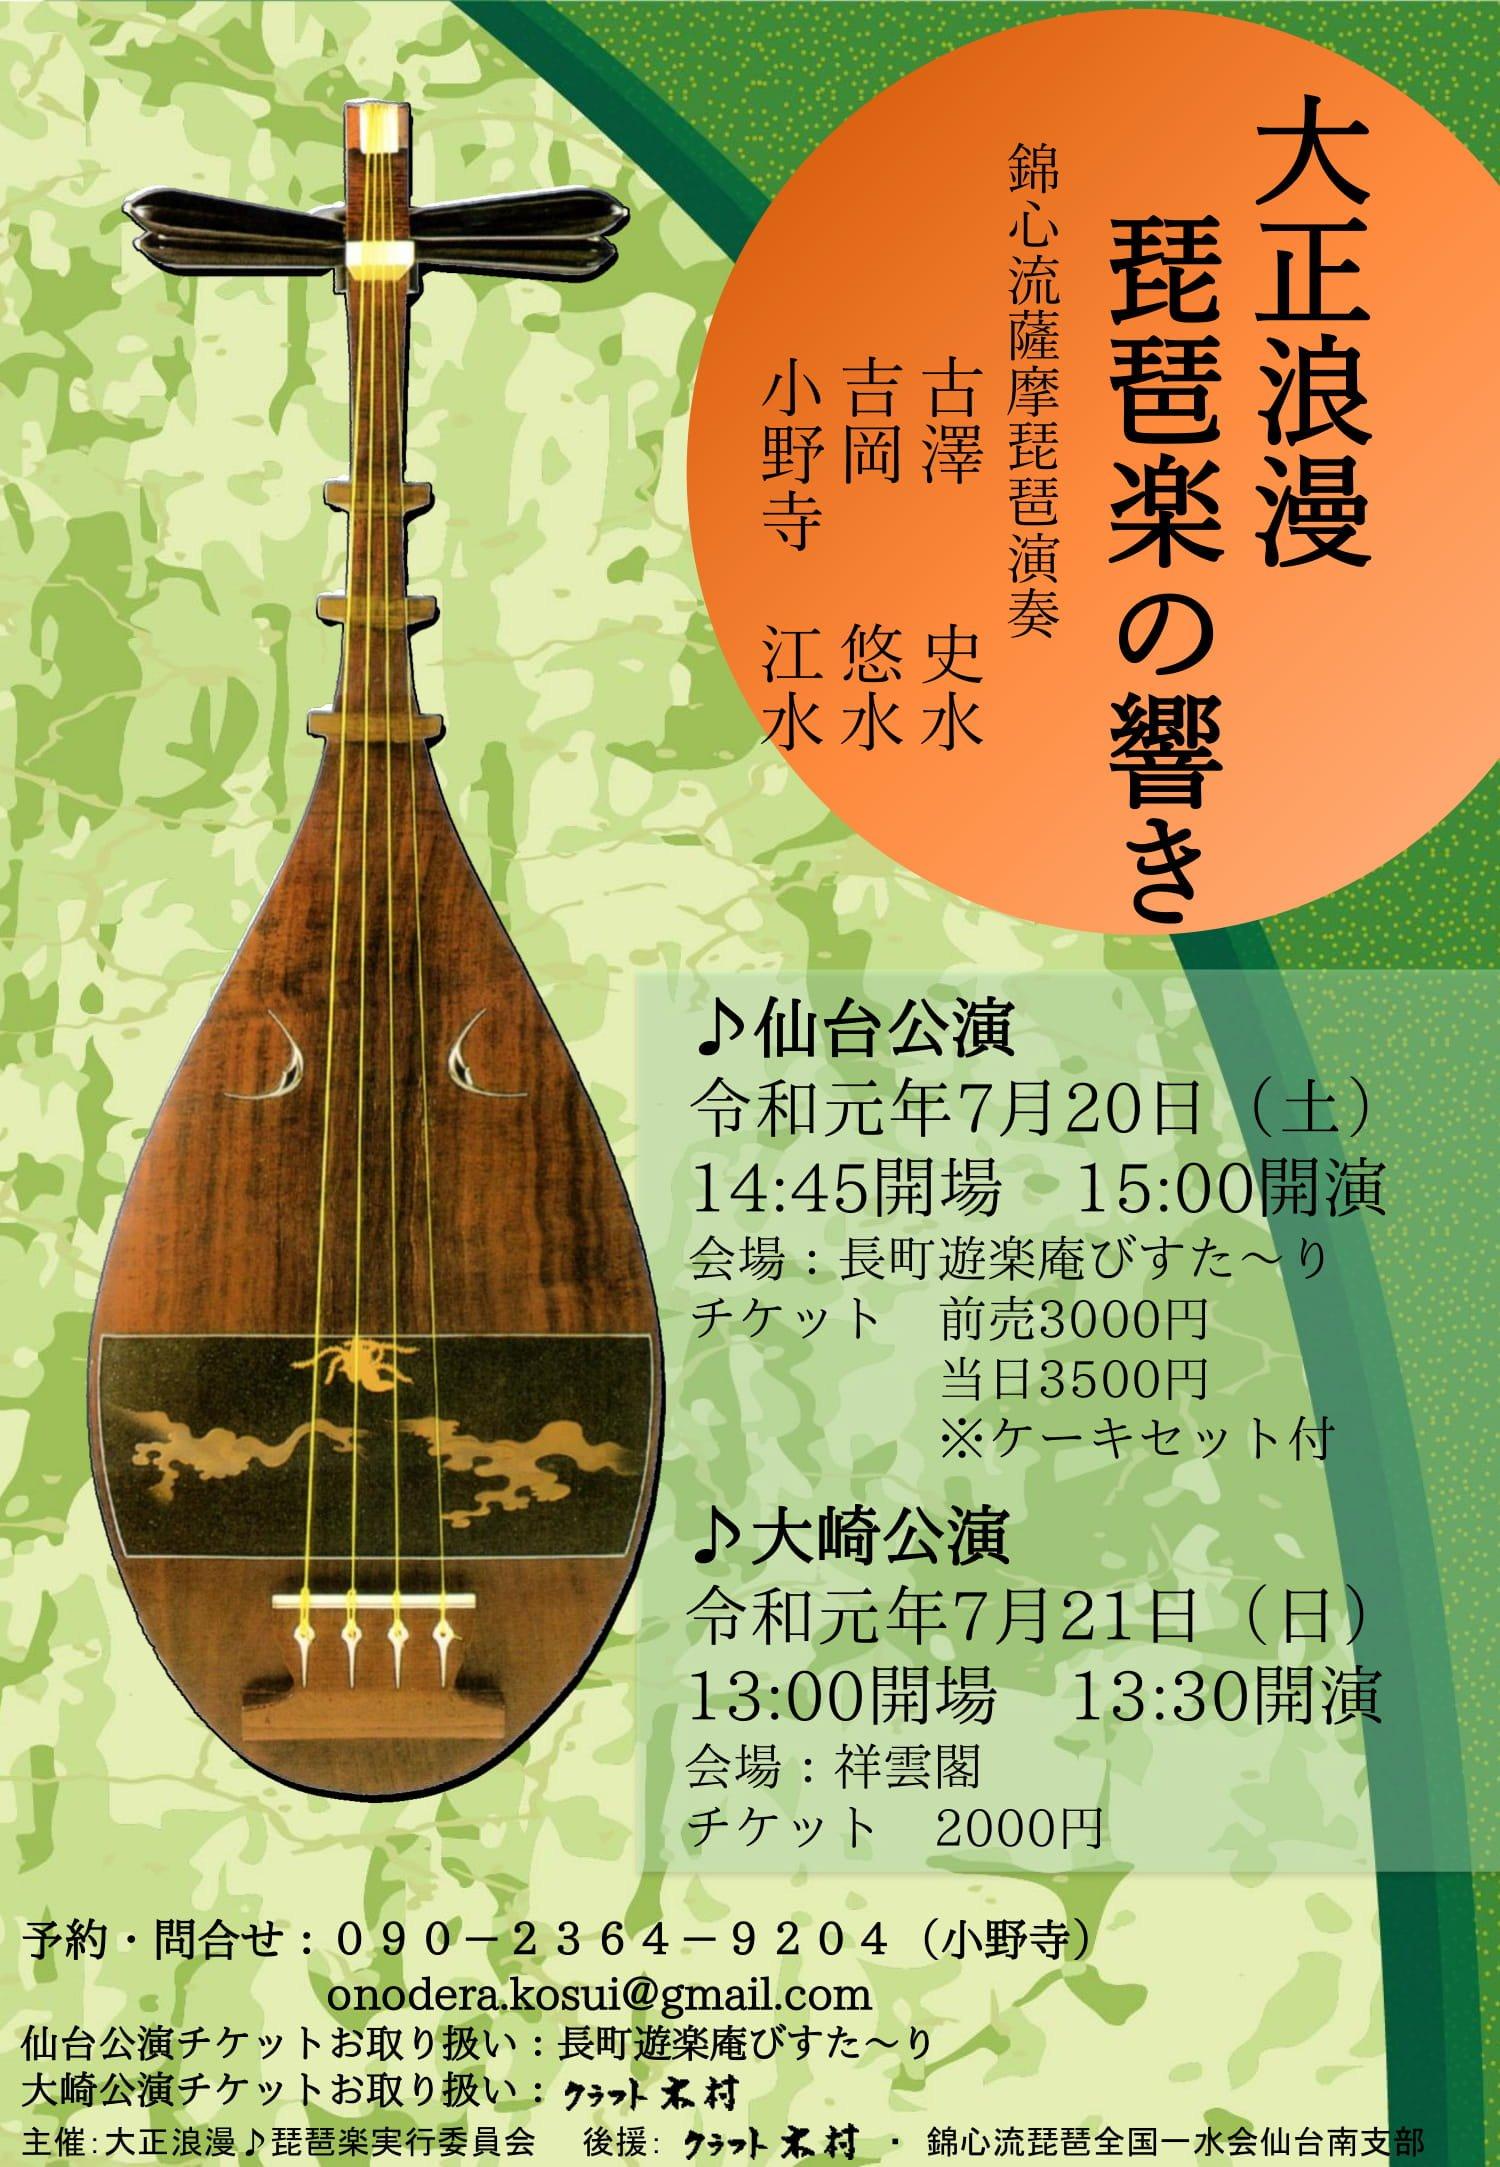 大正浪漫 琵琶楽の響き 仙台公演